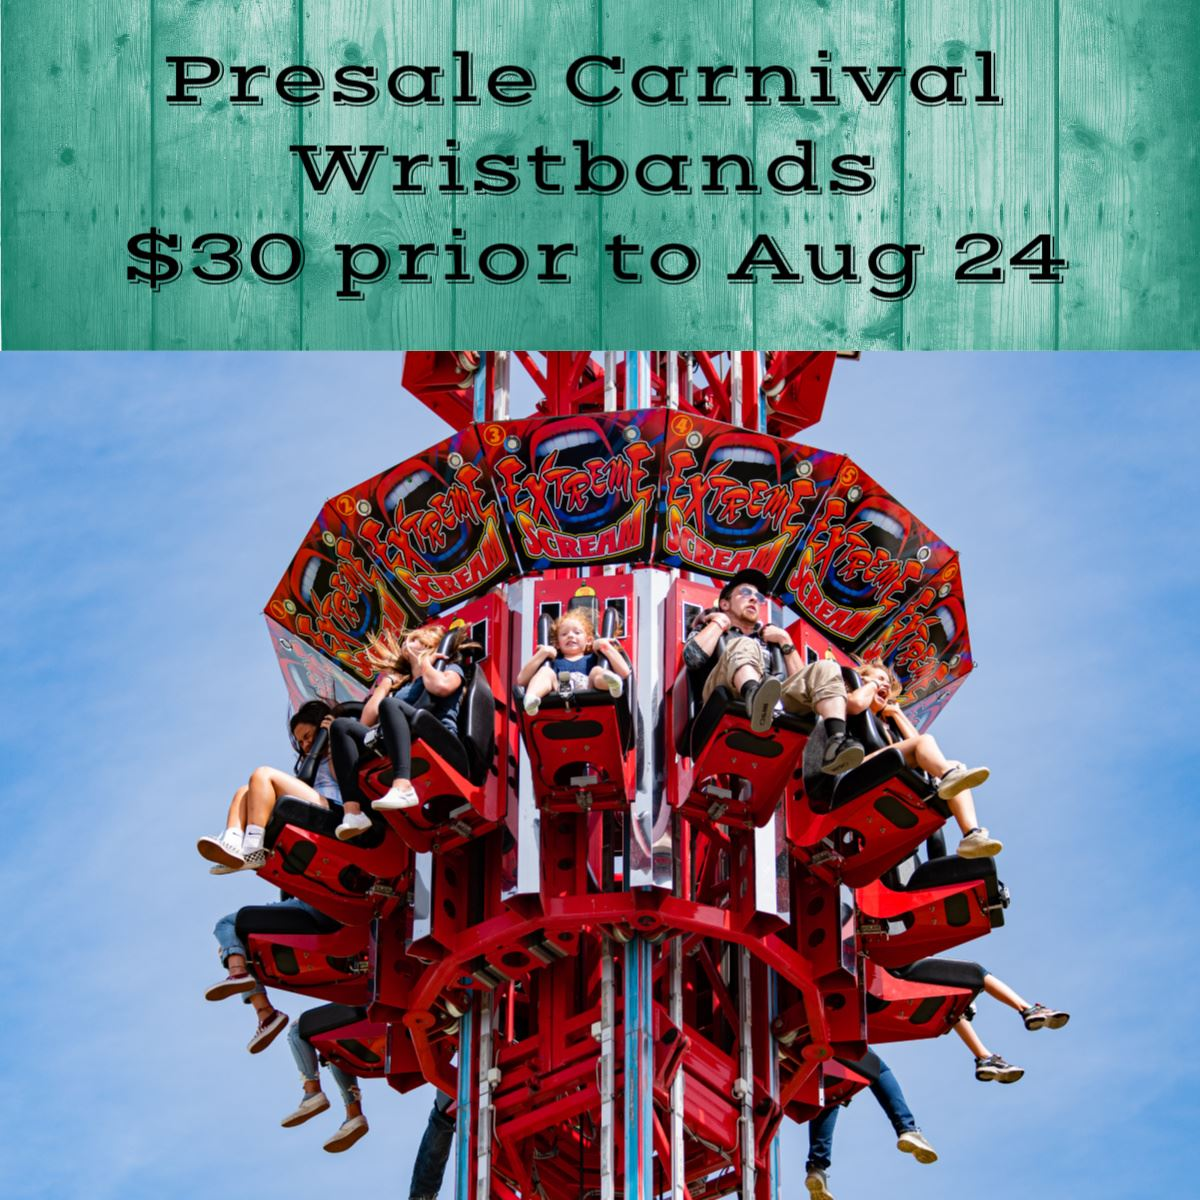 Presale Carnival Wristband $30 prior to Aug 24